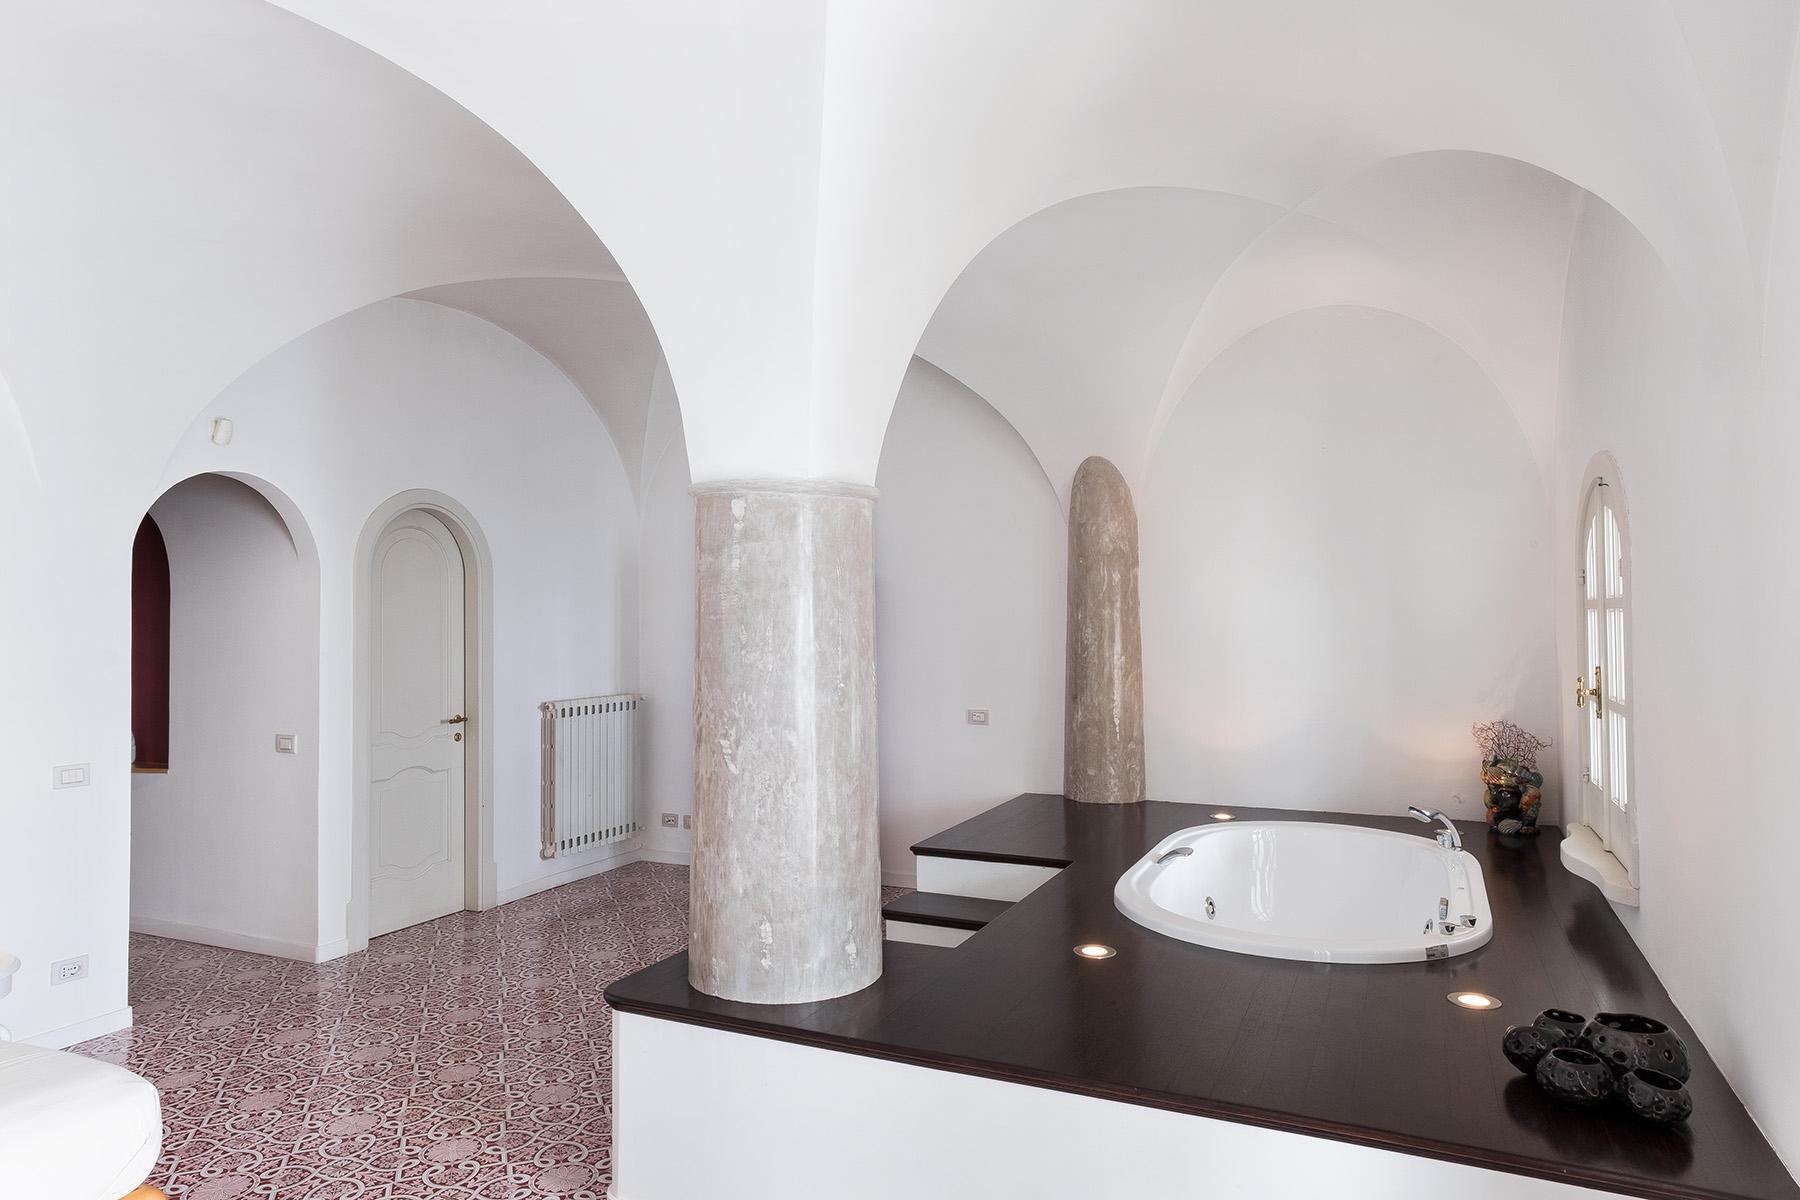 Casa indipendente in Vendita a Praiano: 4 locali, 250 mq - Foto 23